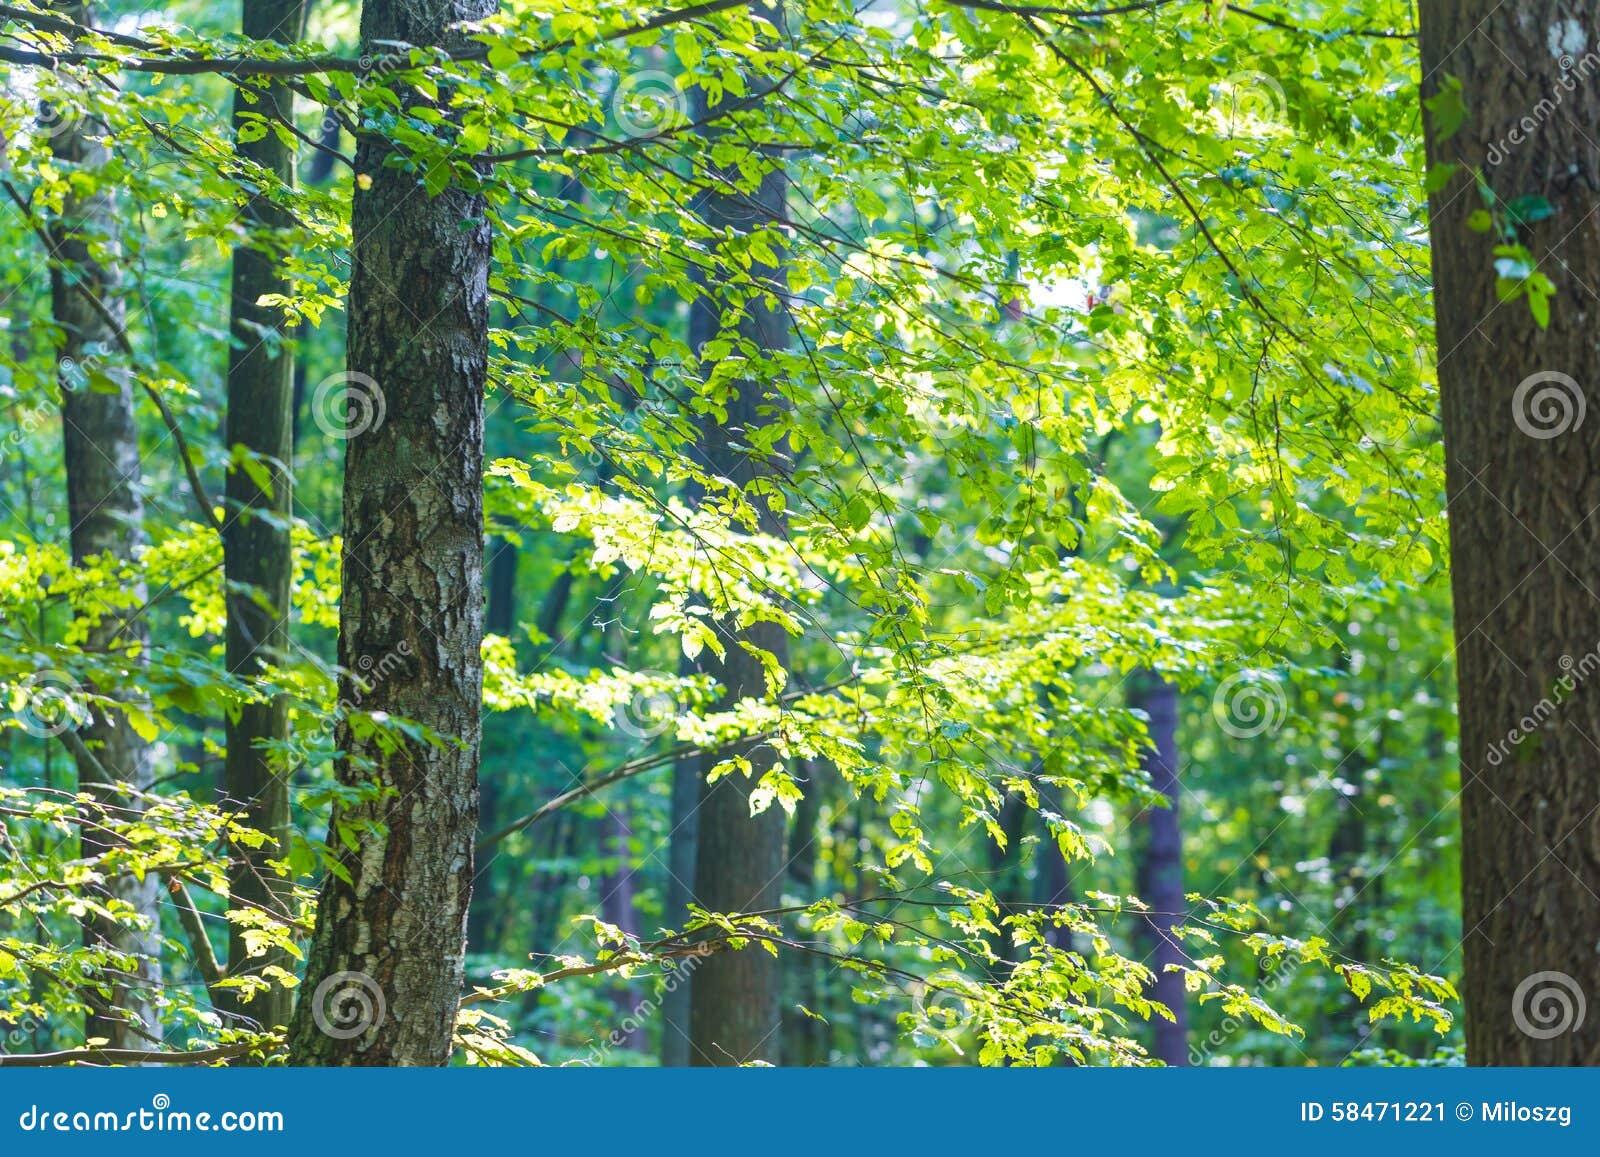 abstract tree branches stock image cartoondealercom